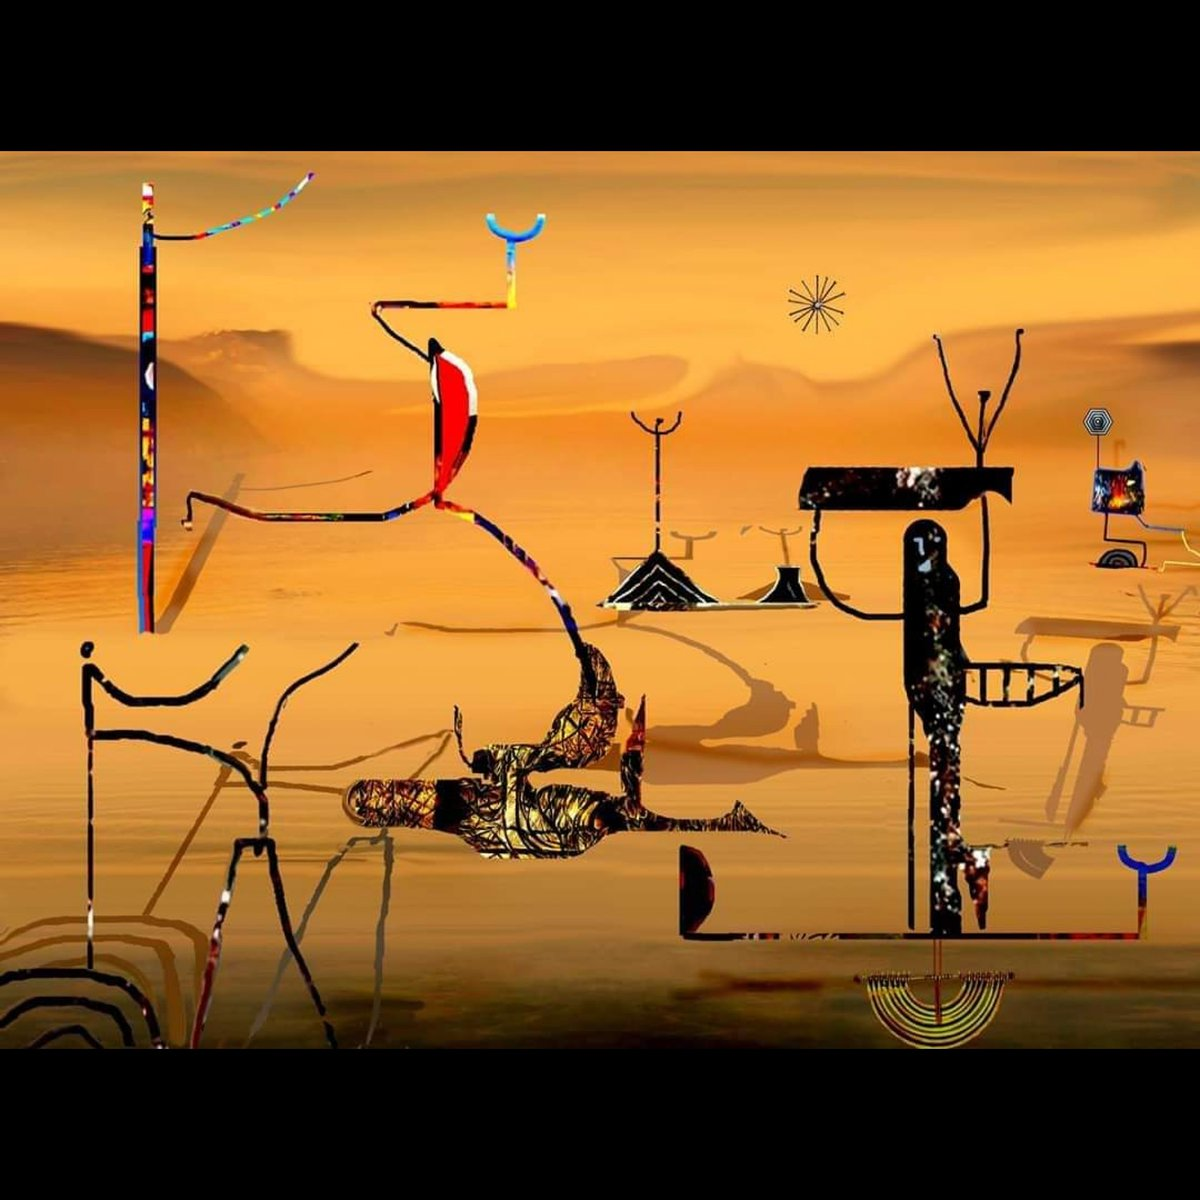 "Roberto Saavedra Walker Art            ""Sculptscape"" #Surrealism #artcollector #culturegram #saatchiart #artnow #artsglobal #ars_mundi #finearts  #fundaciondearte #artspace #virtualgallery #kultur #artecontemporanea #artcollective #art_gallery #exhibition #artrepresent https://t.co/66FI4M1Nvo"